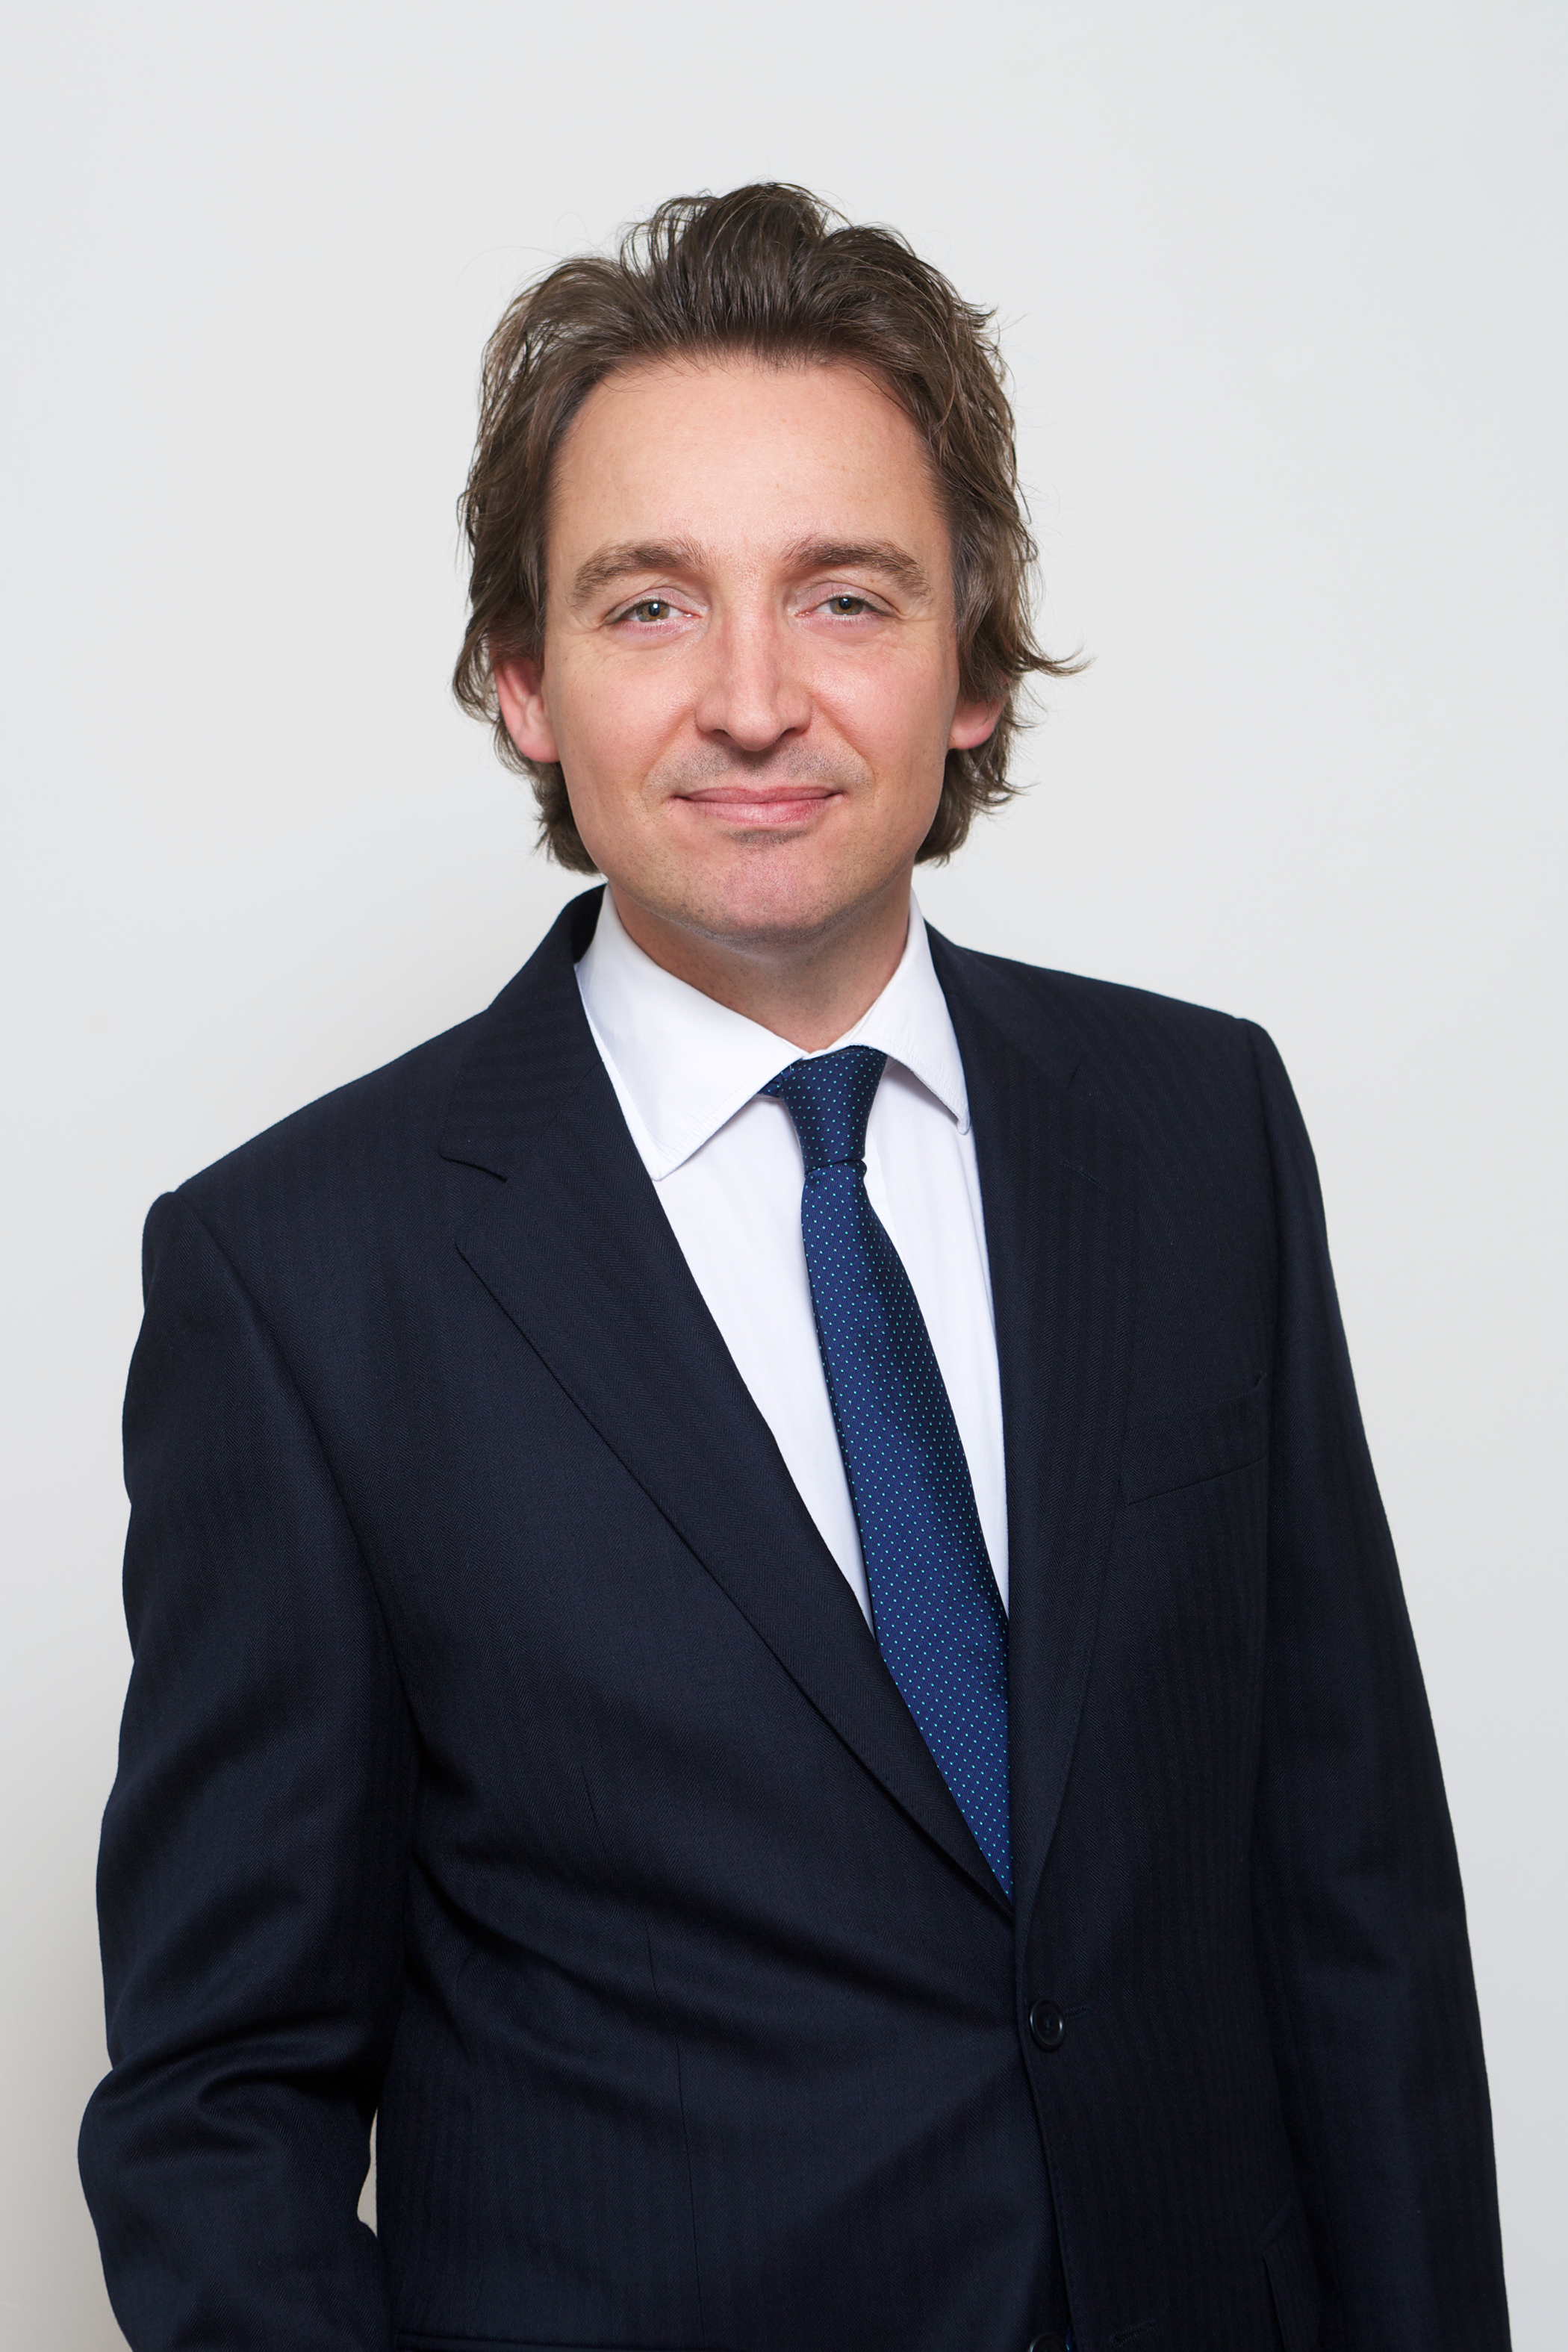 Johannes Angenent, BA (Hons) (Dunelm), CPE, LPC